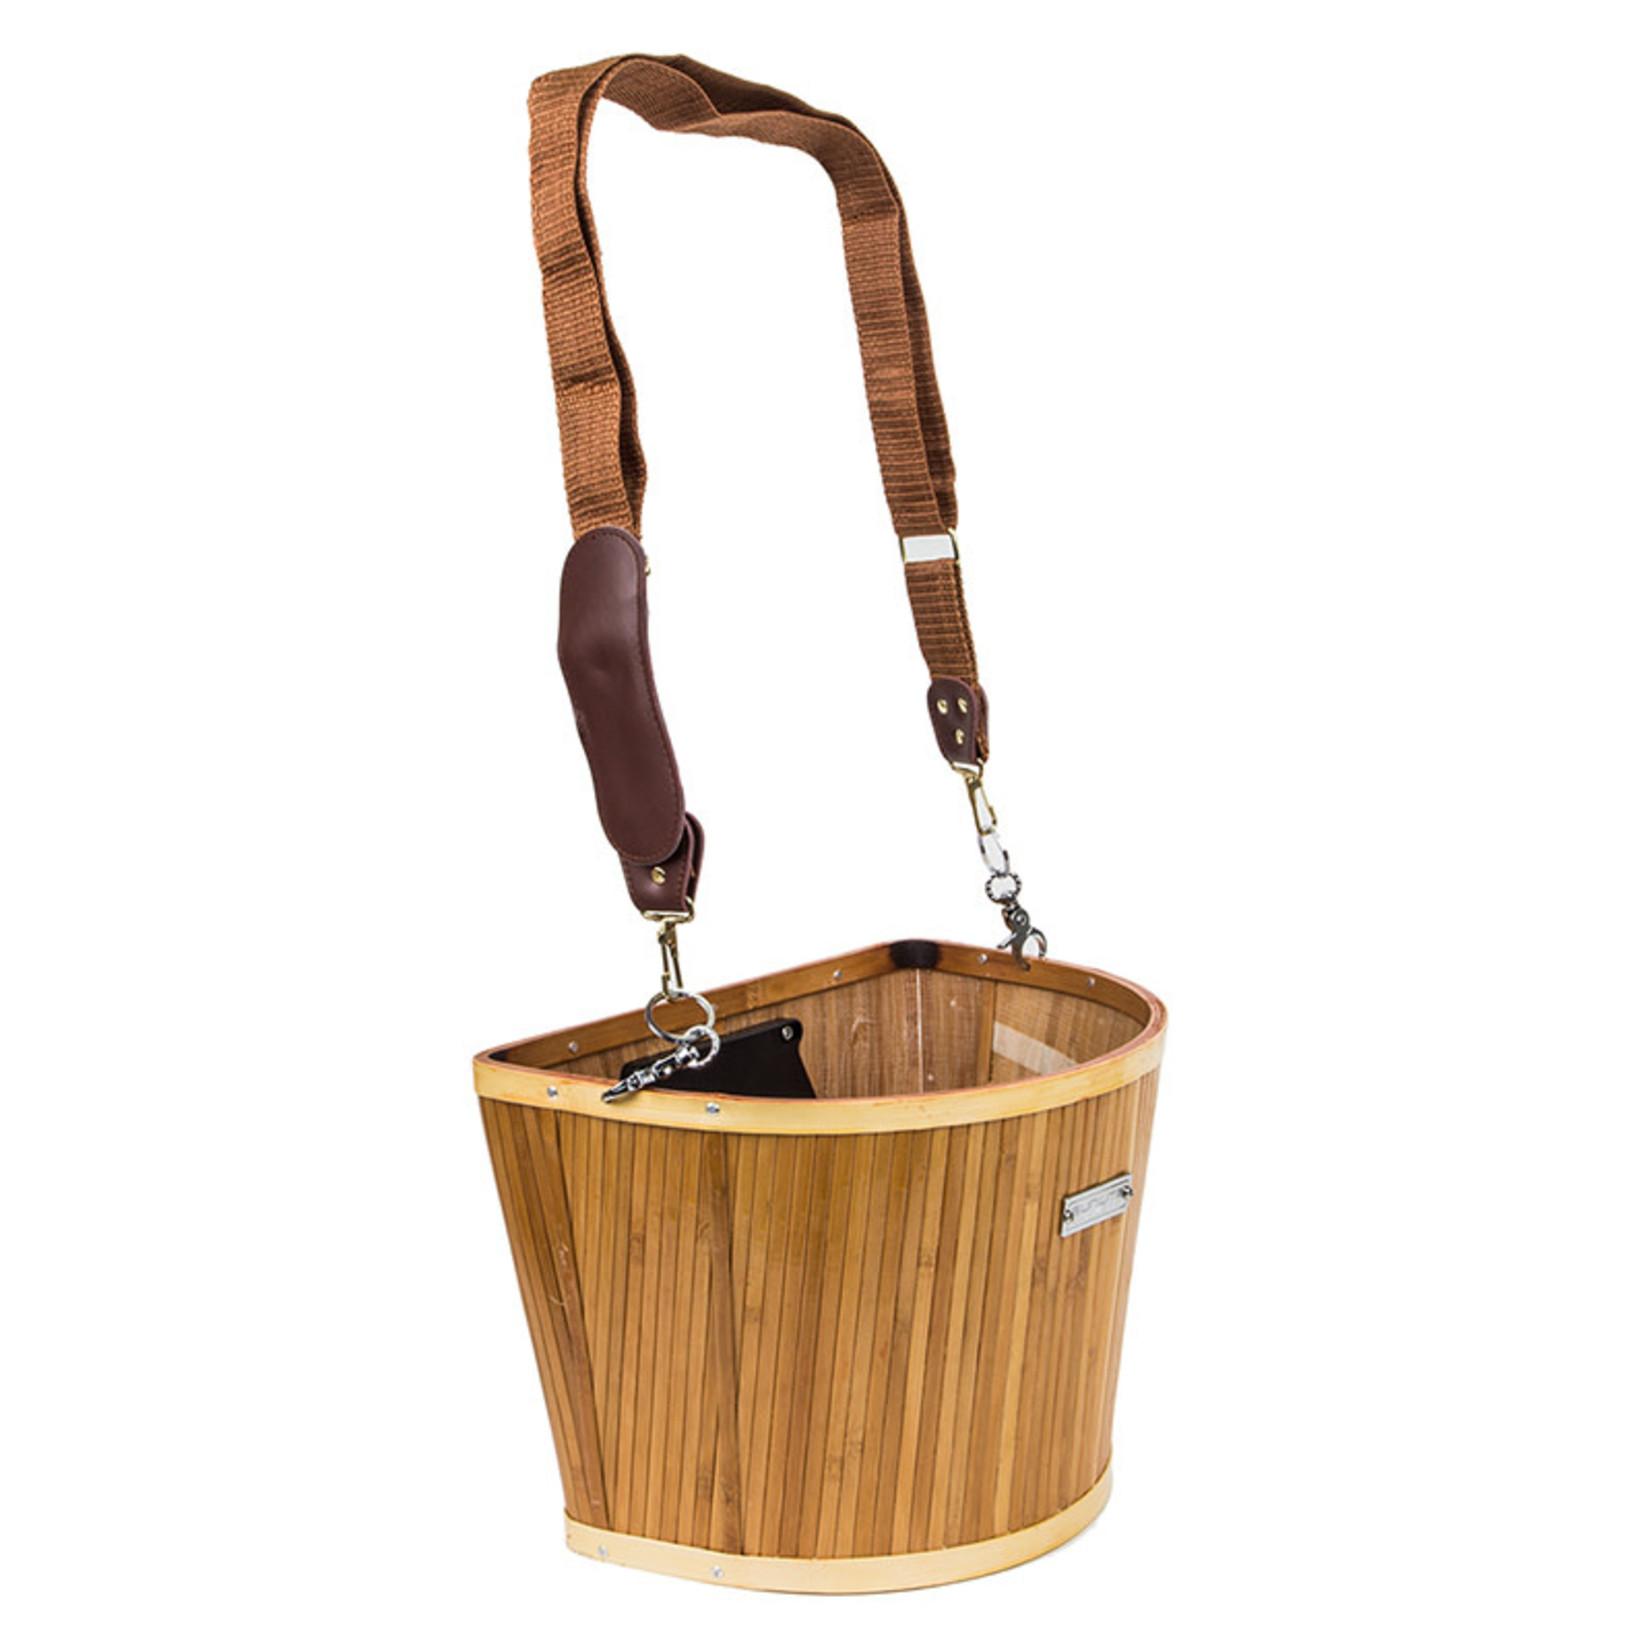 Sunlite Front Basket Bamboo w/Bracket